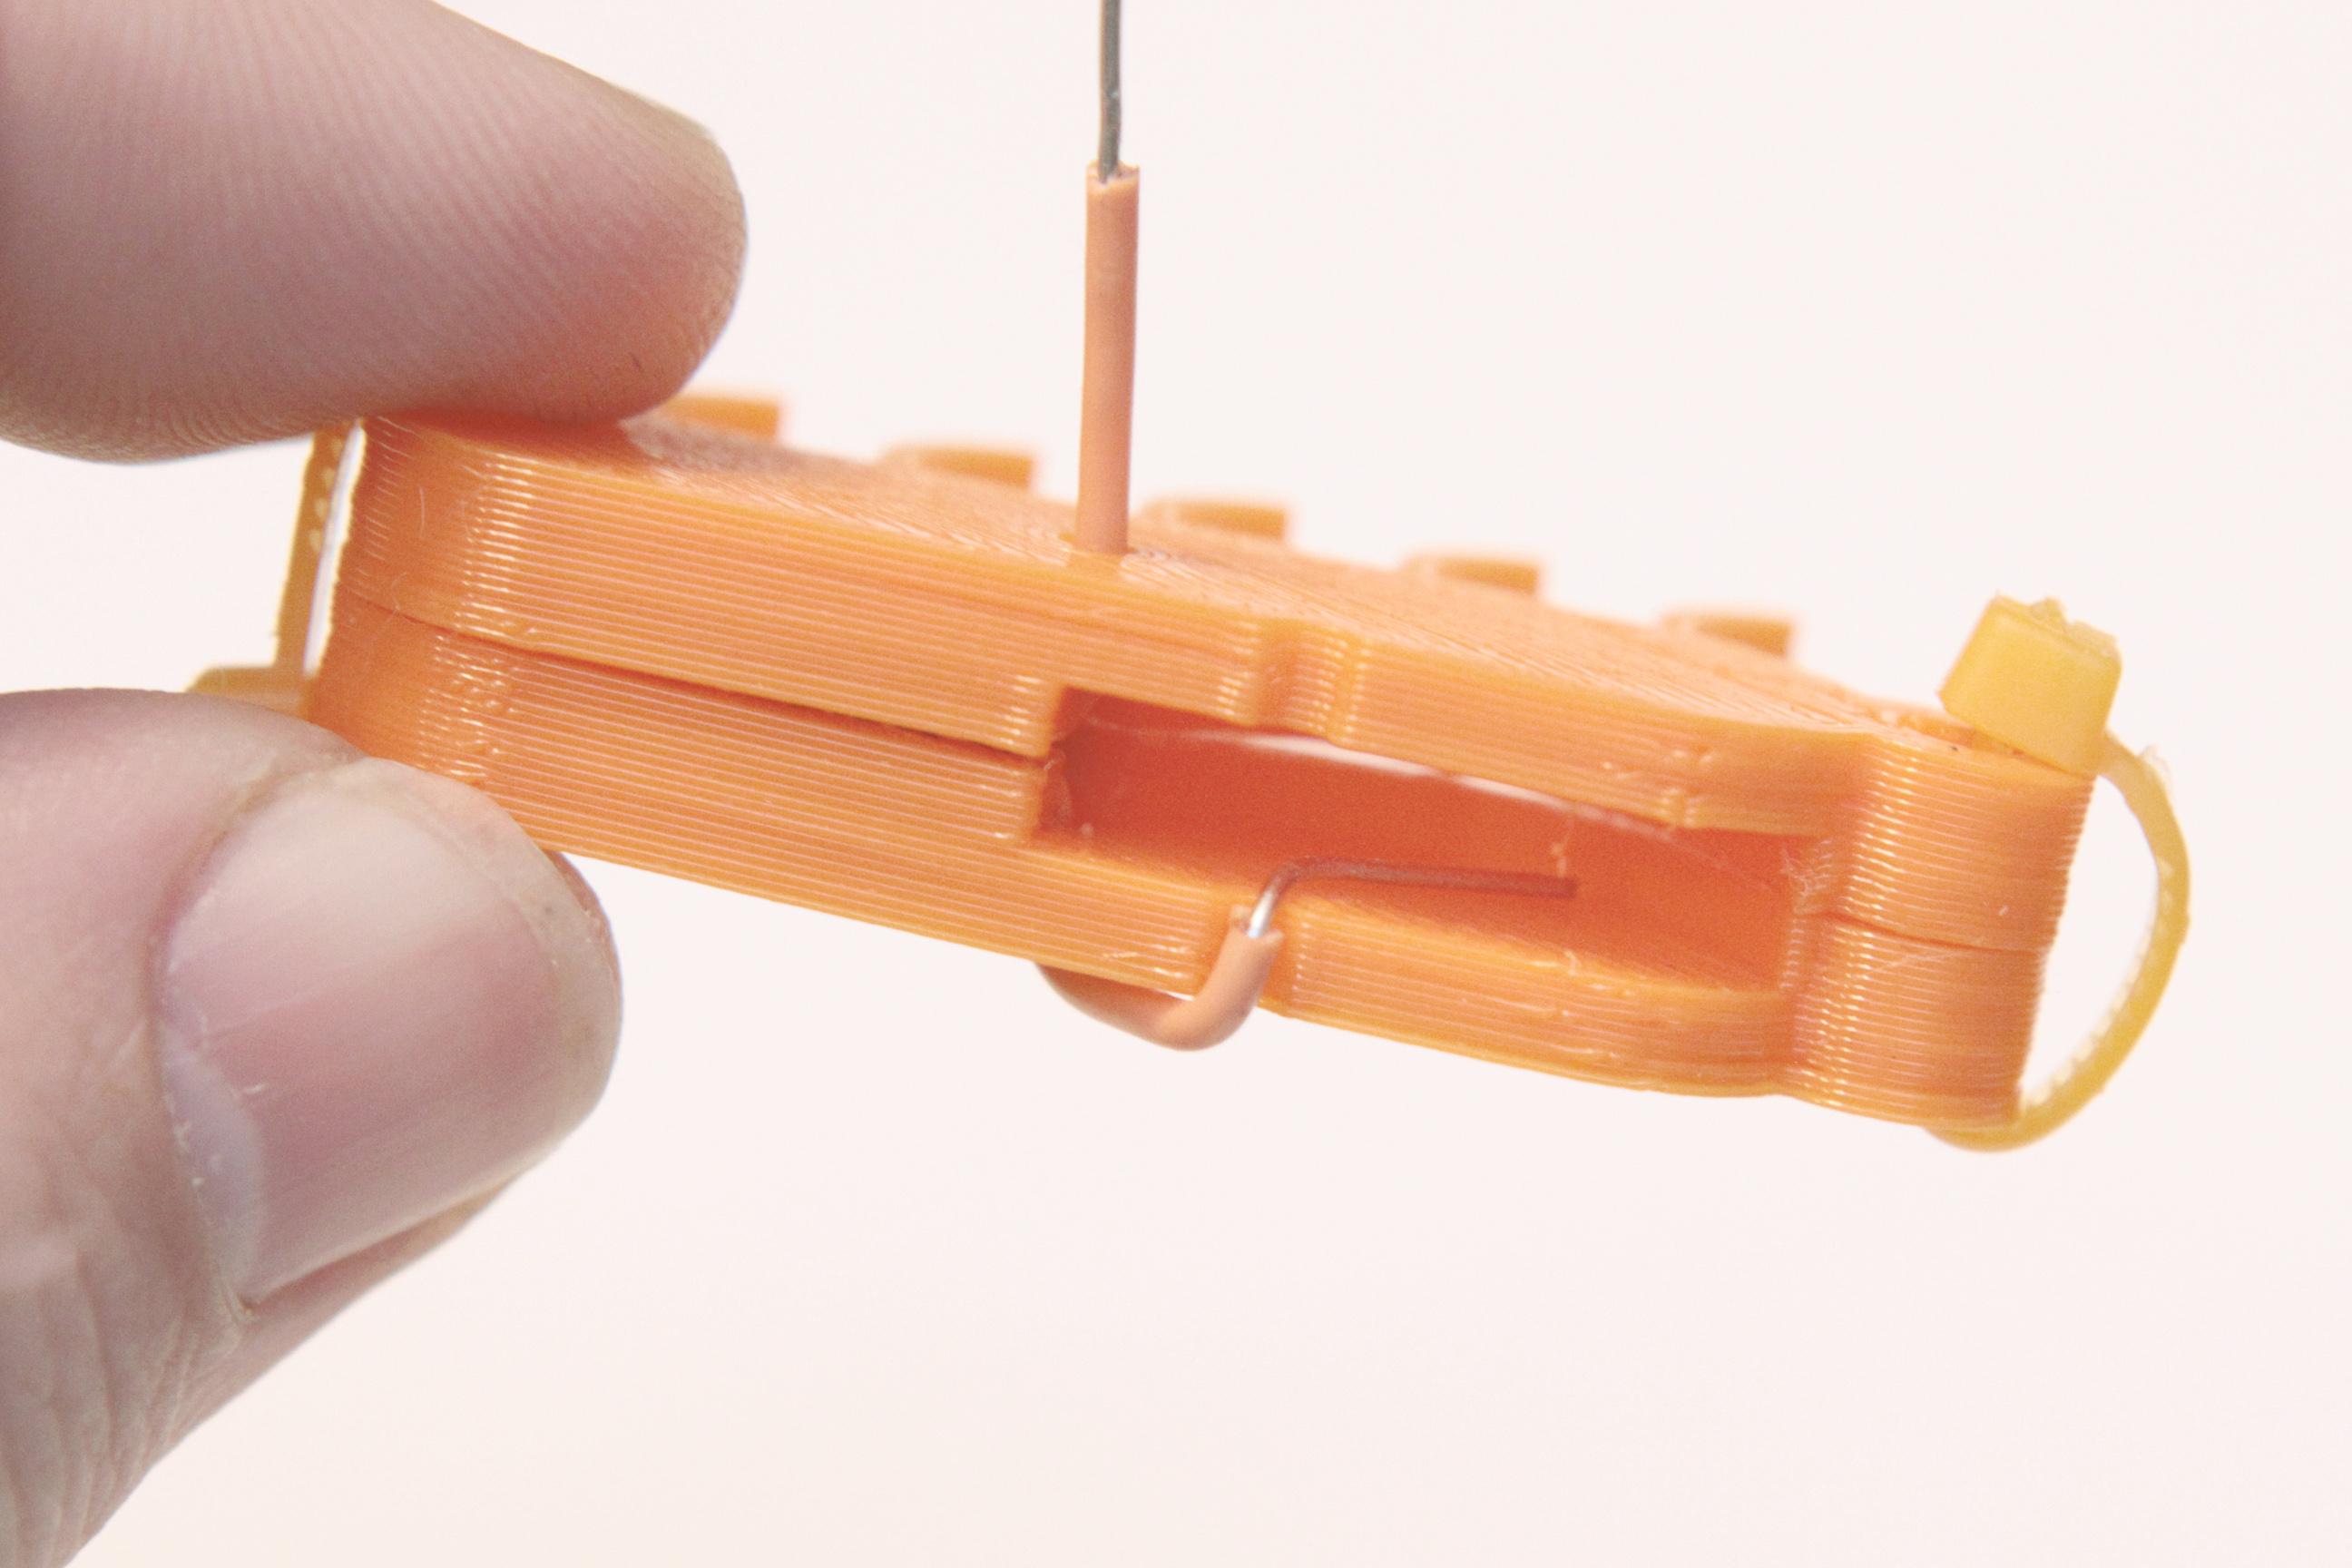 components_IMG_9006.jpg